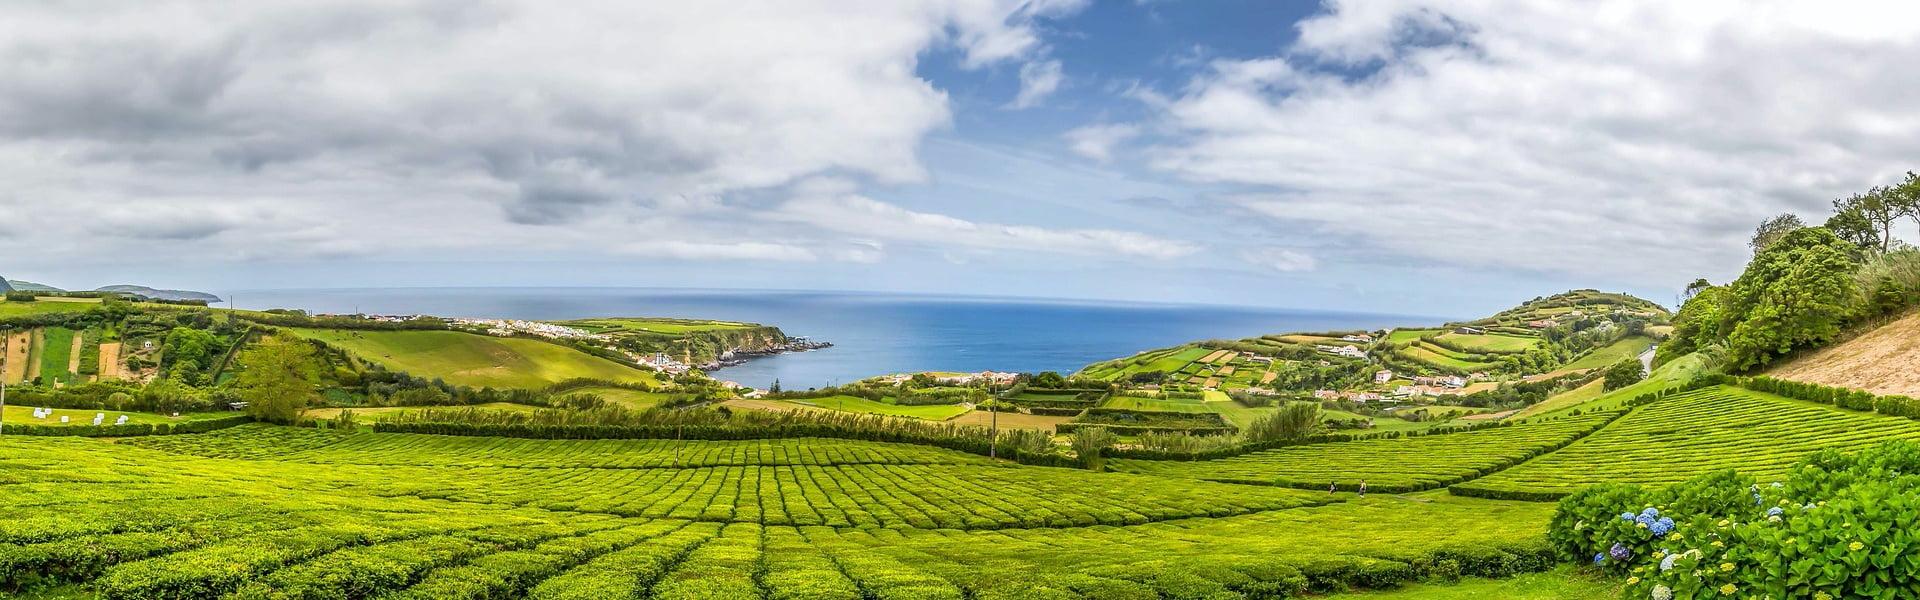 Portugal | Wandelen op de Azoren